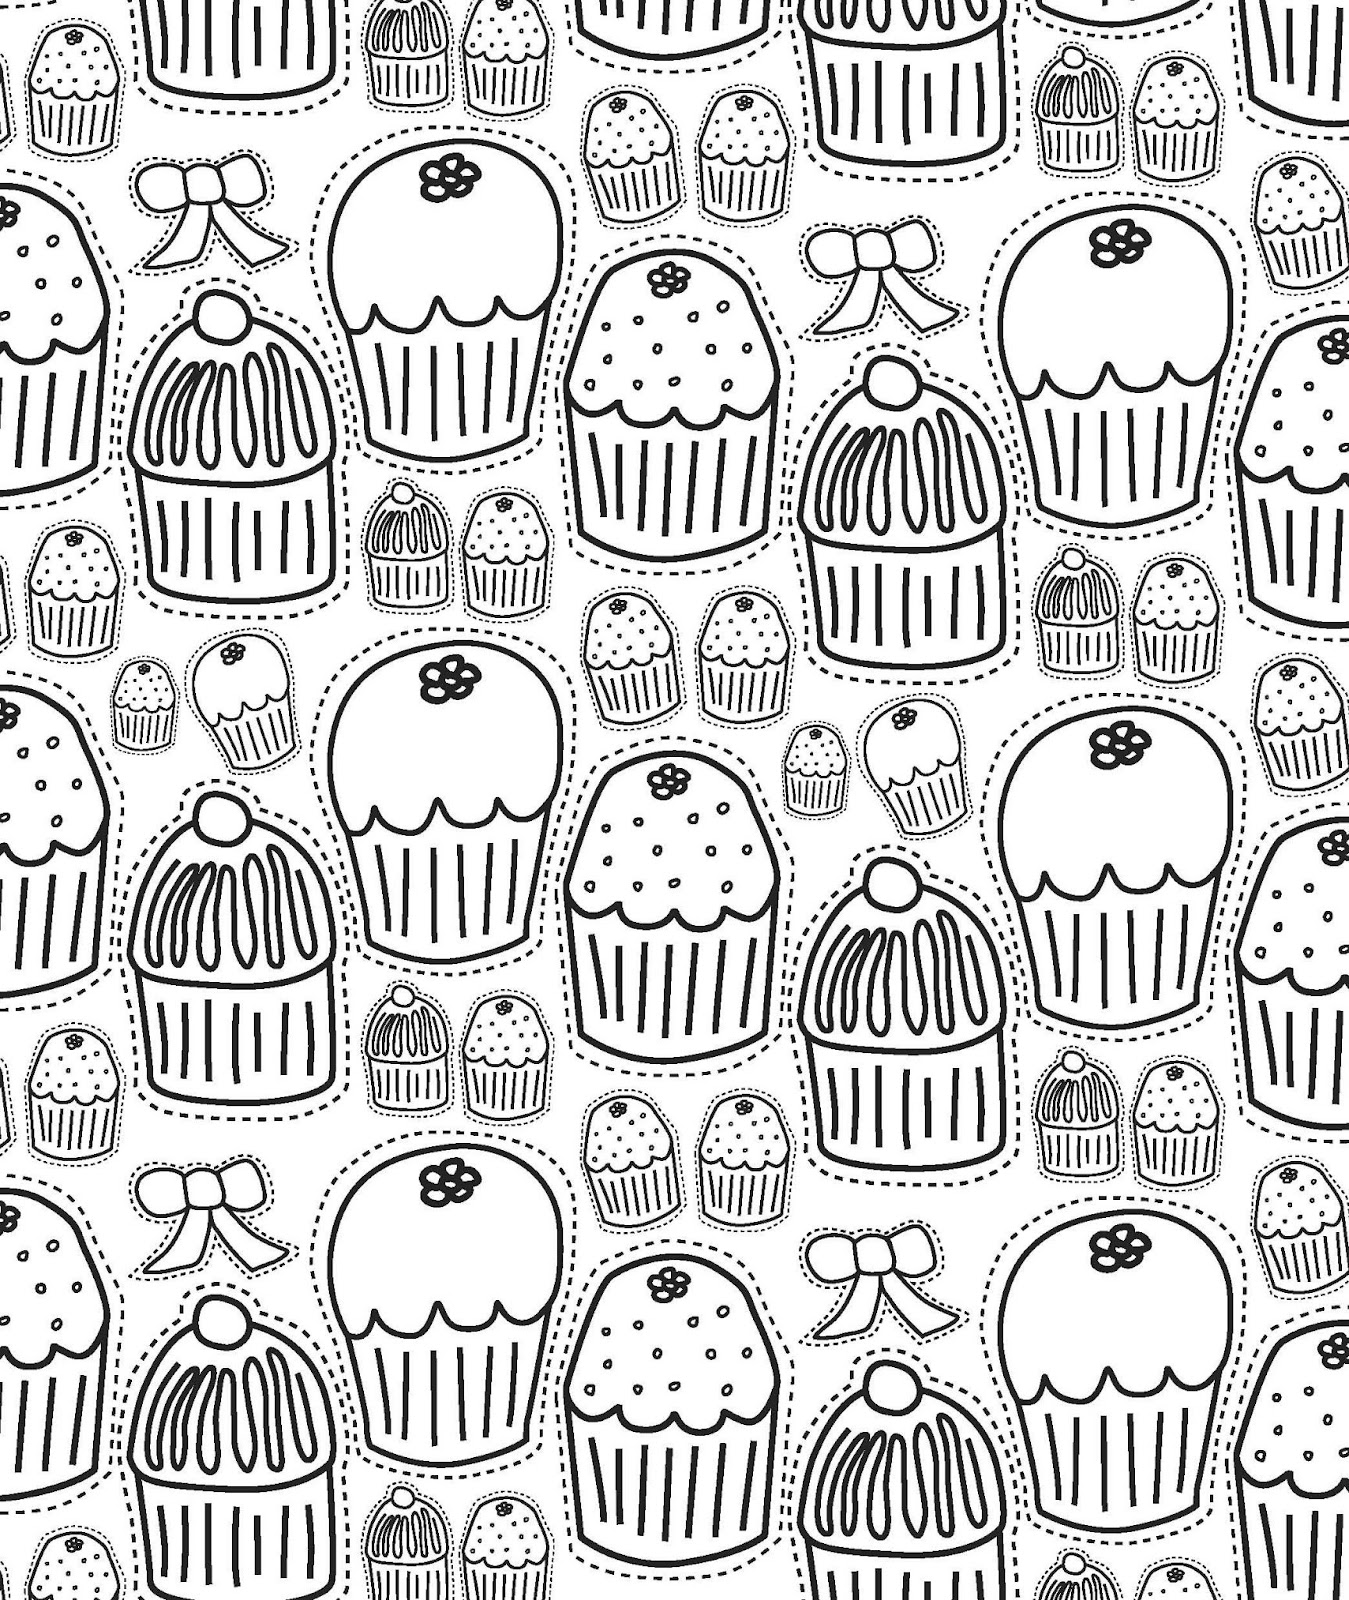 http://2.bp.blogspot.com/-muOFxwhin8o/T1_OJFu7QkI/AAAAAAAAFpo/NdZktoFwXA8/s1600/wallpaper_cakes.jpg